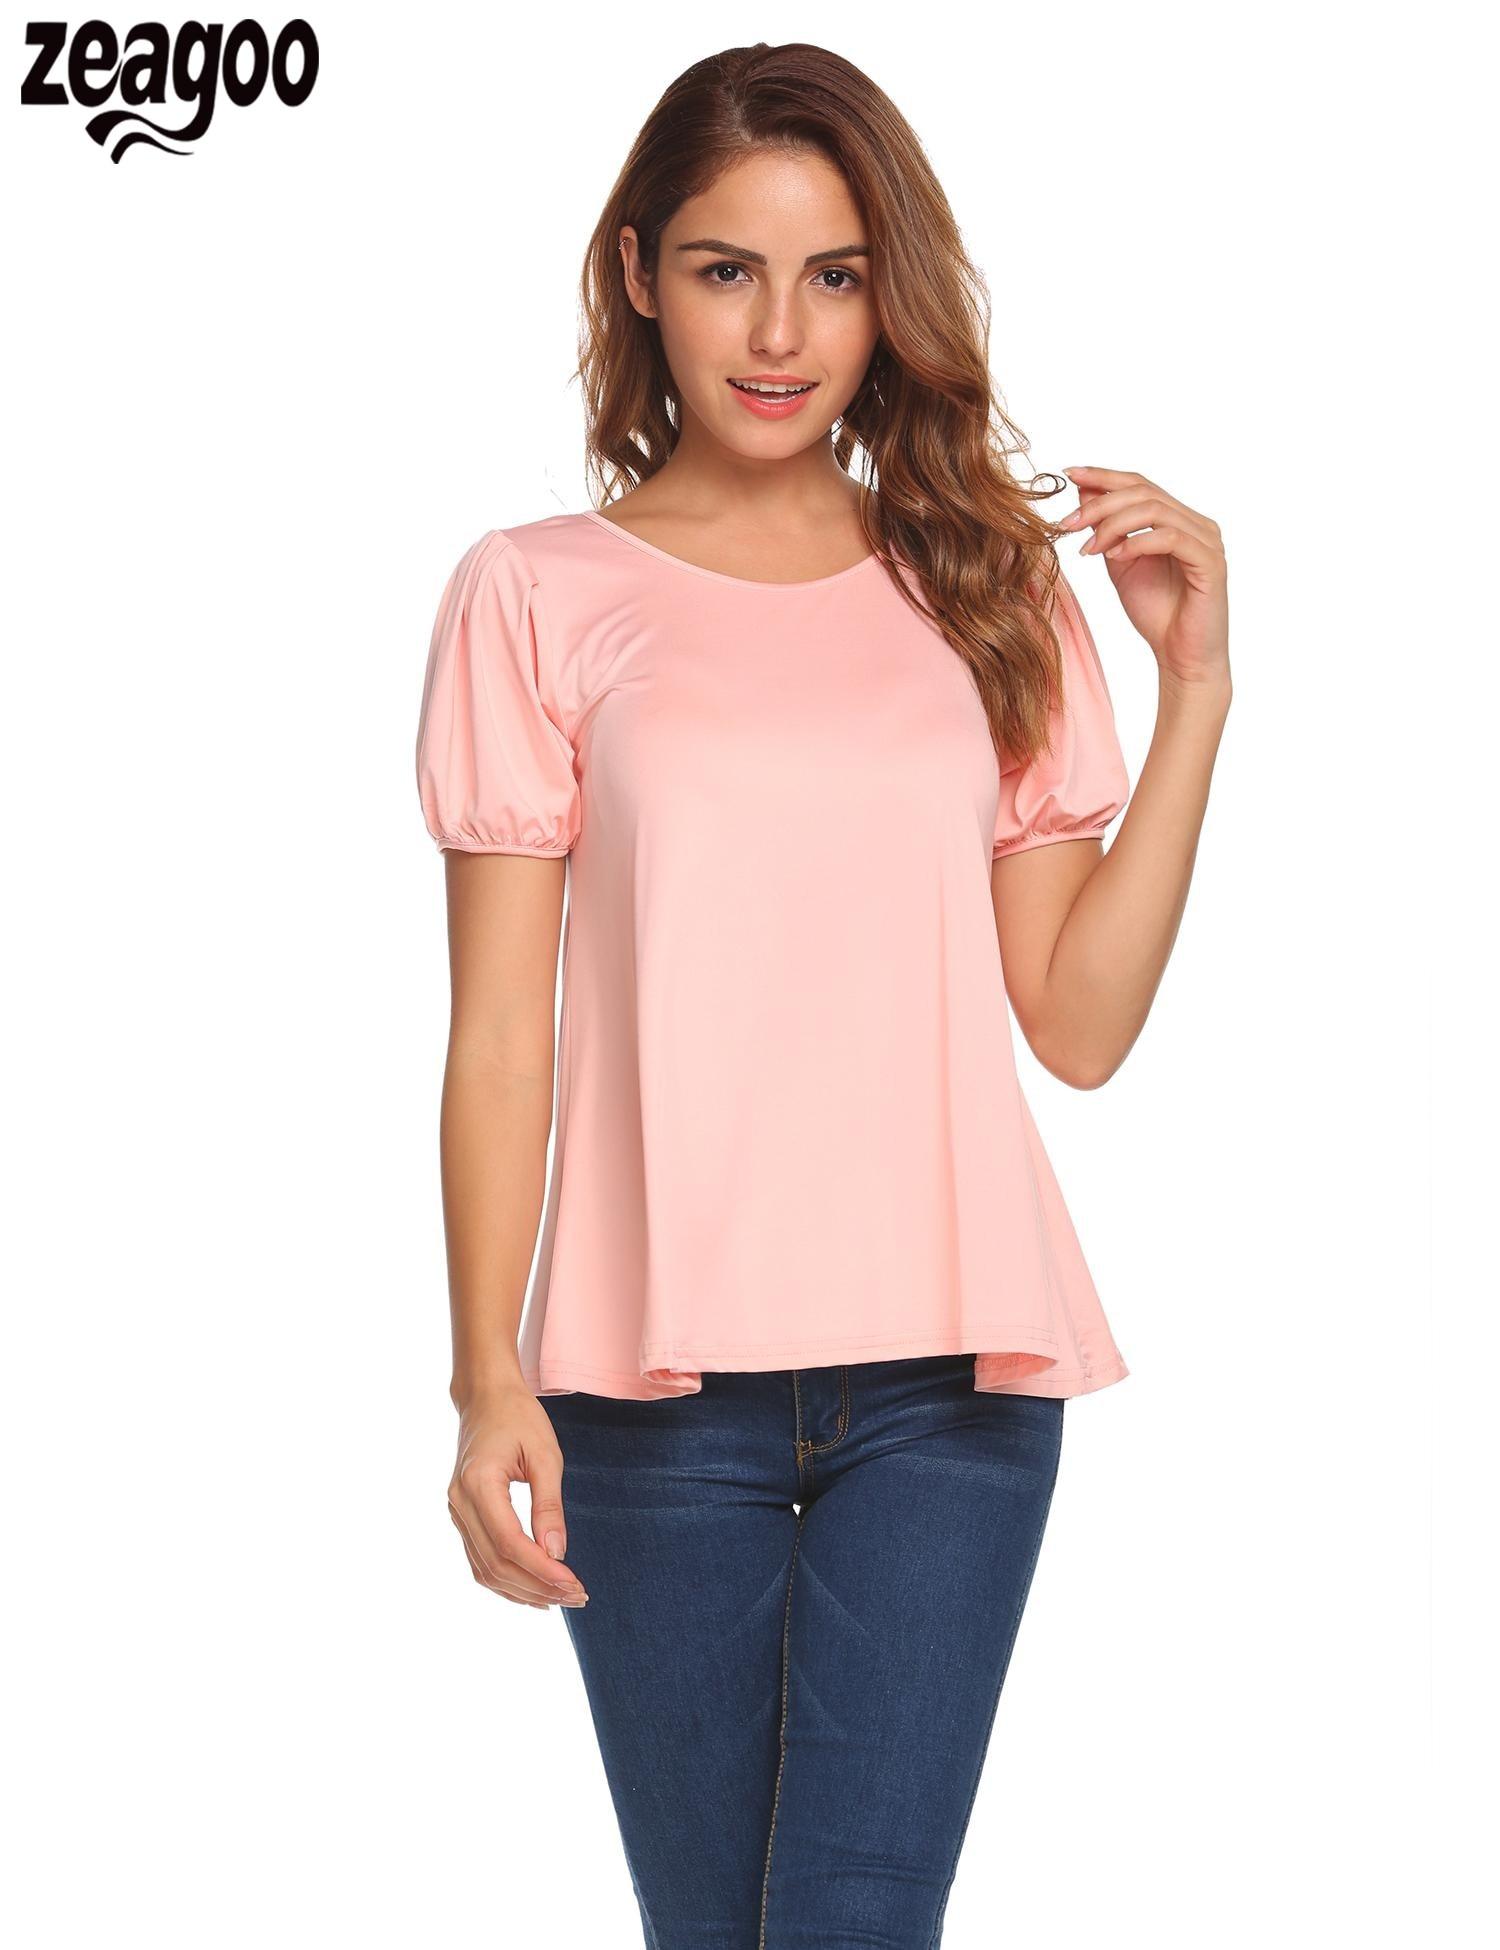 Zeagoo 2018 Summer T shirt Women Fashion O-Neck Lantern Short Sleeve Solid Pullover T-Shirts Women Tops S-XXXL Plus Size